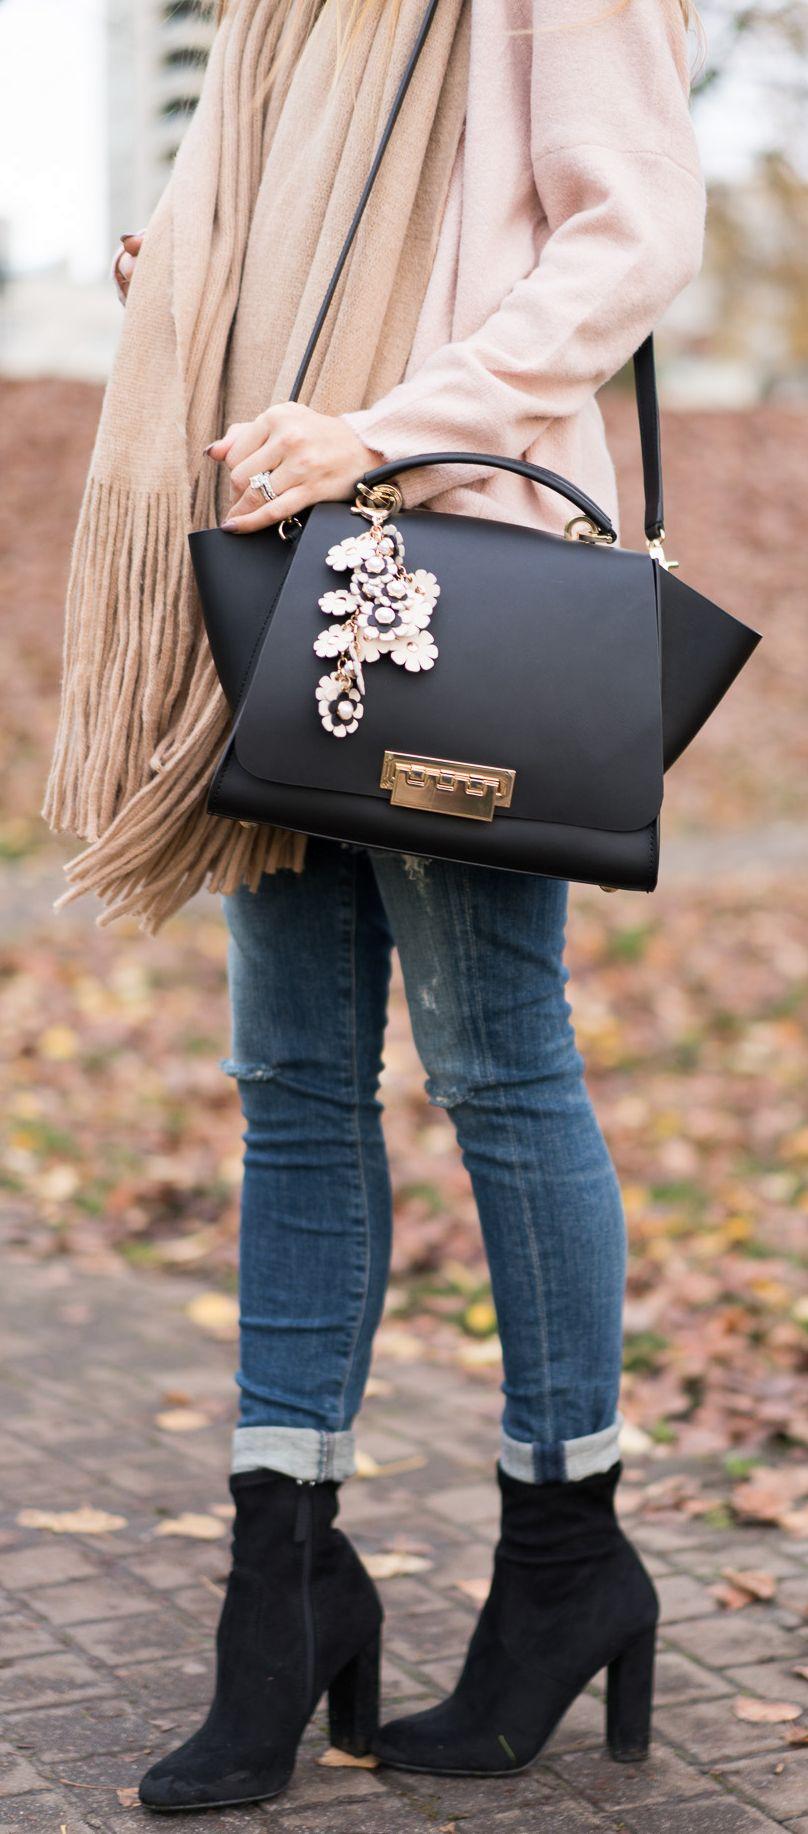 6e320d9c10b Fall Outfit  Blush Sweater - Legging Ankle Jeans - Scarf - Booties - Zac  Zac Posen Handbag - Spring Earthette Floral Charm. Angela Lanter - Hello  Gorgeous.